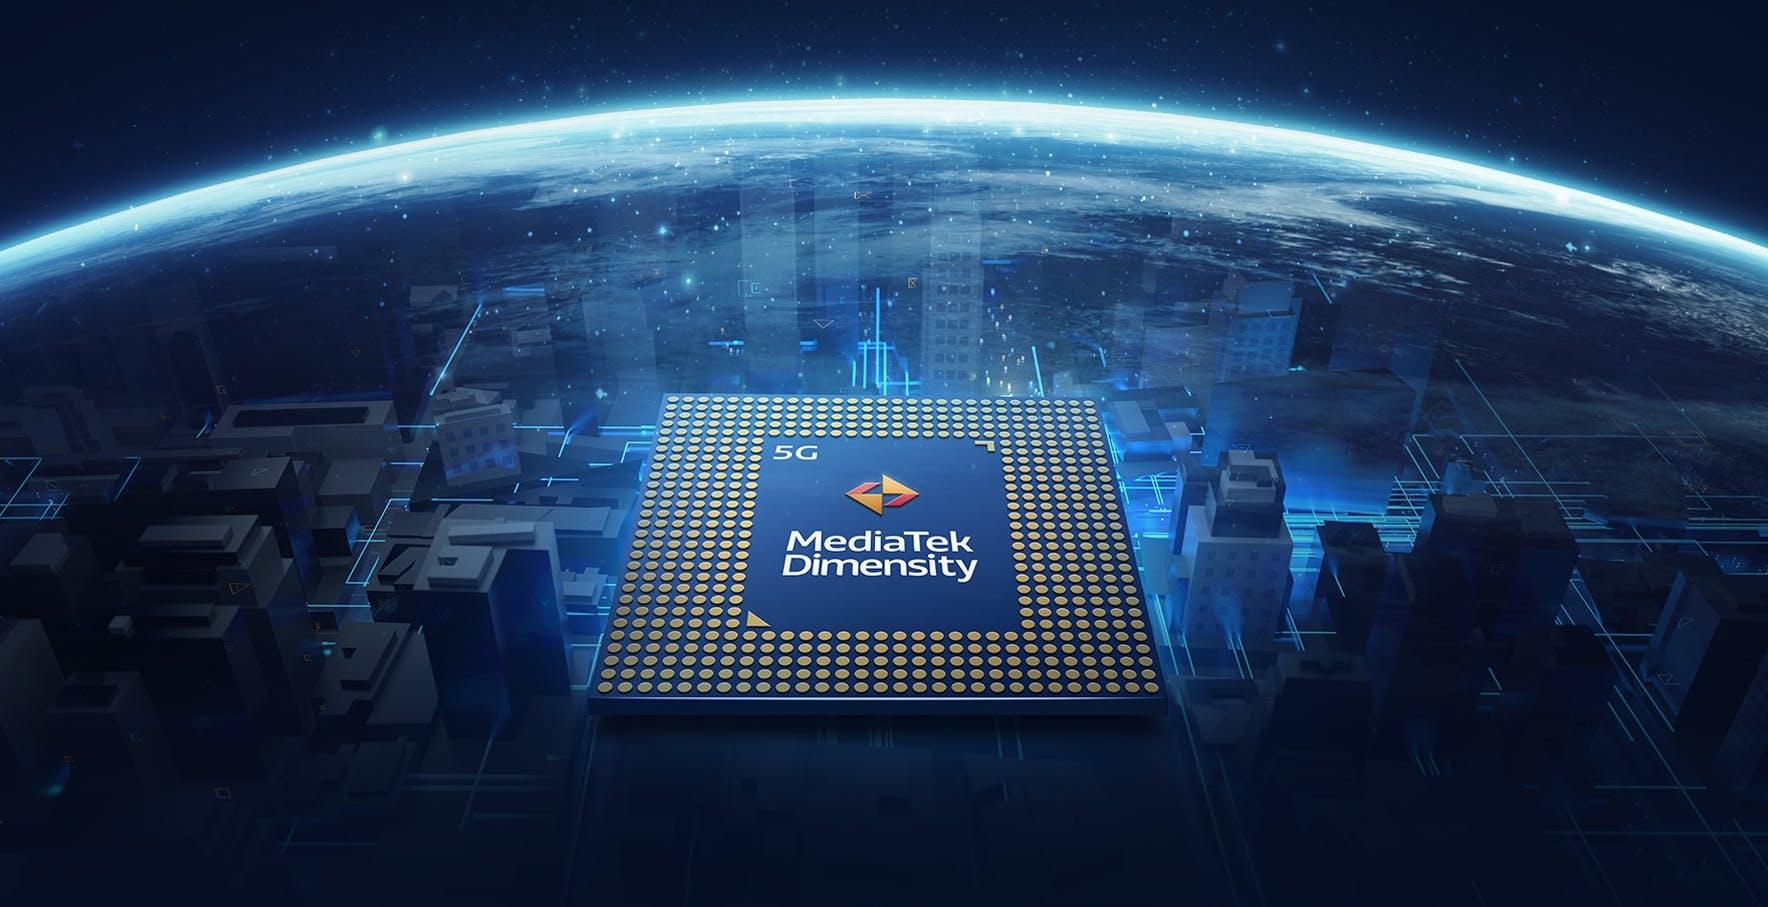 MediaTek è il principale produttore di SoC per smartphone. Ha superato Qualcomm